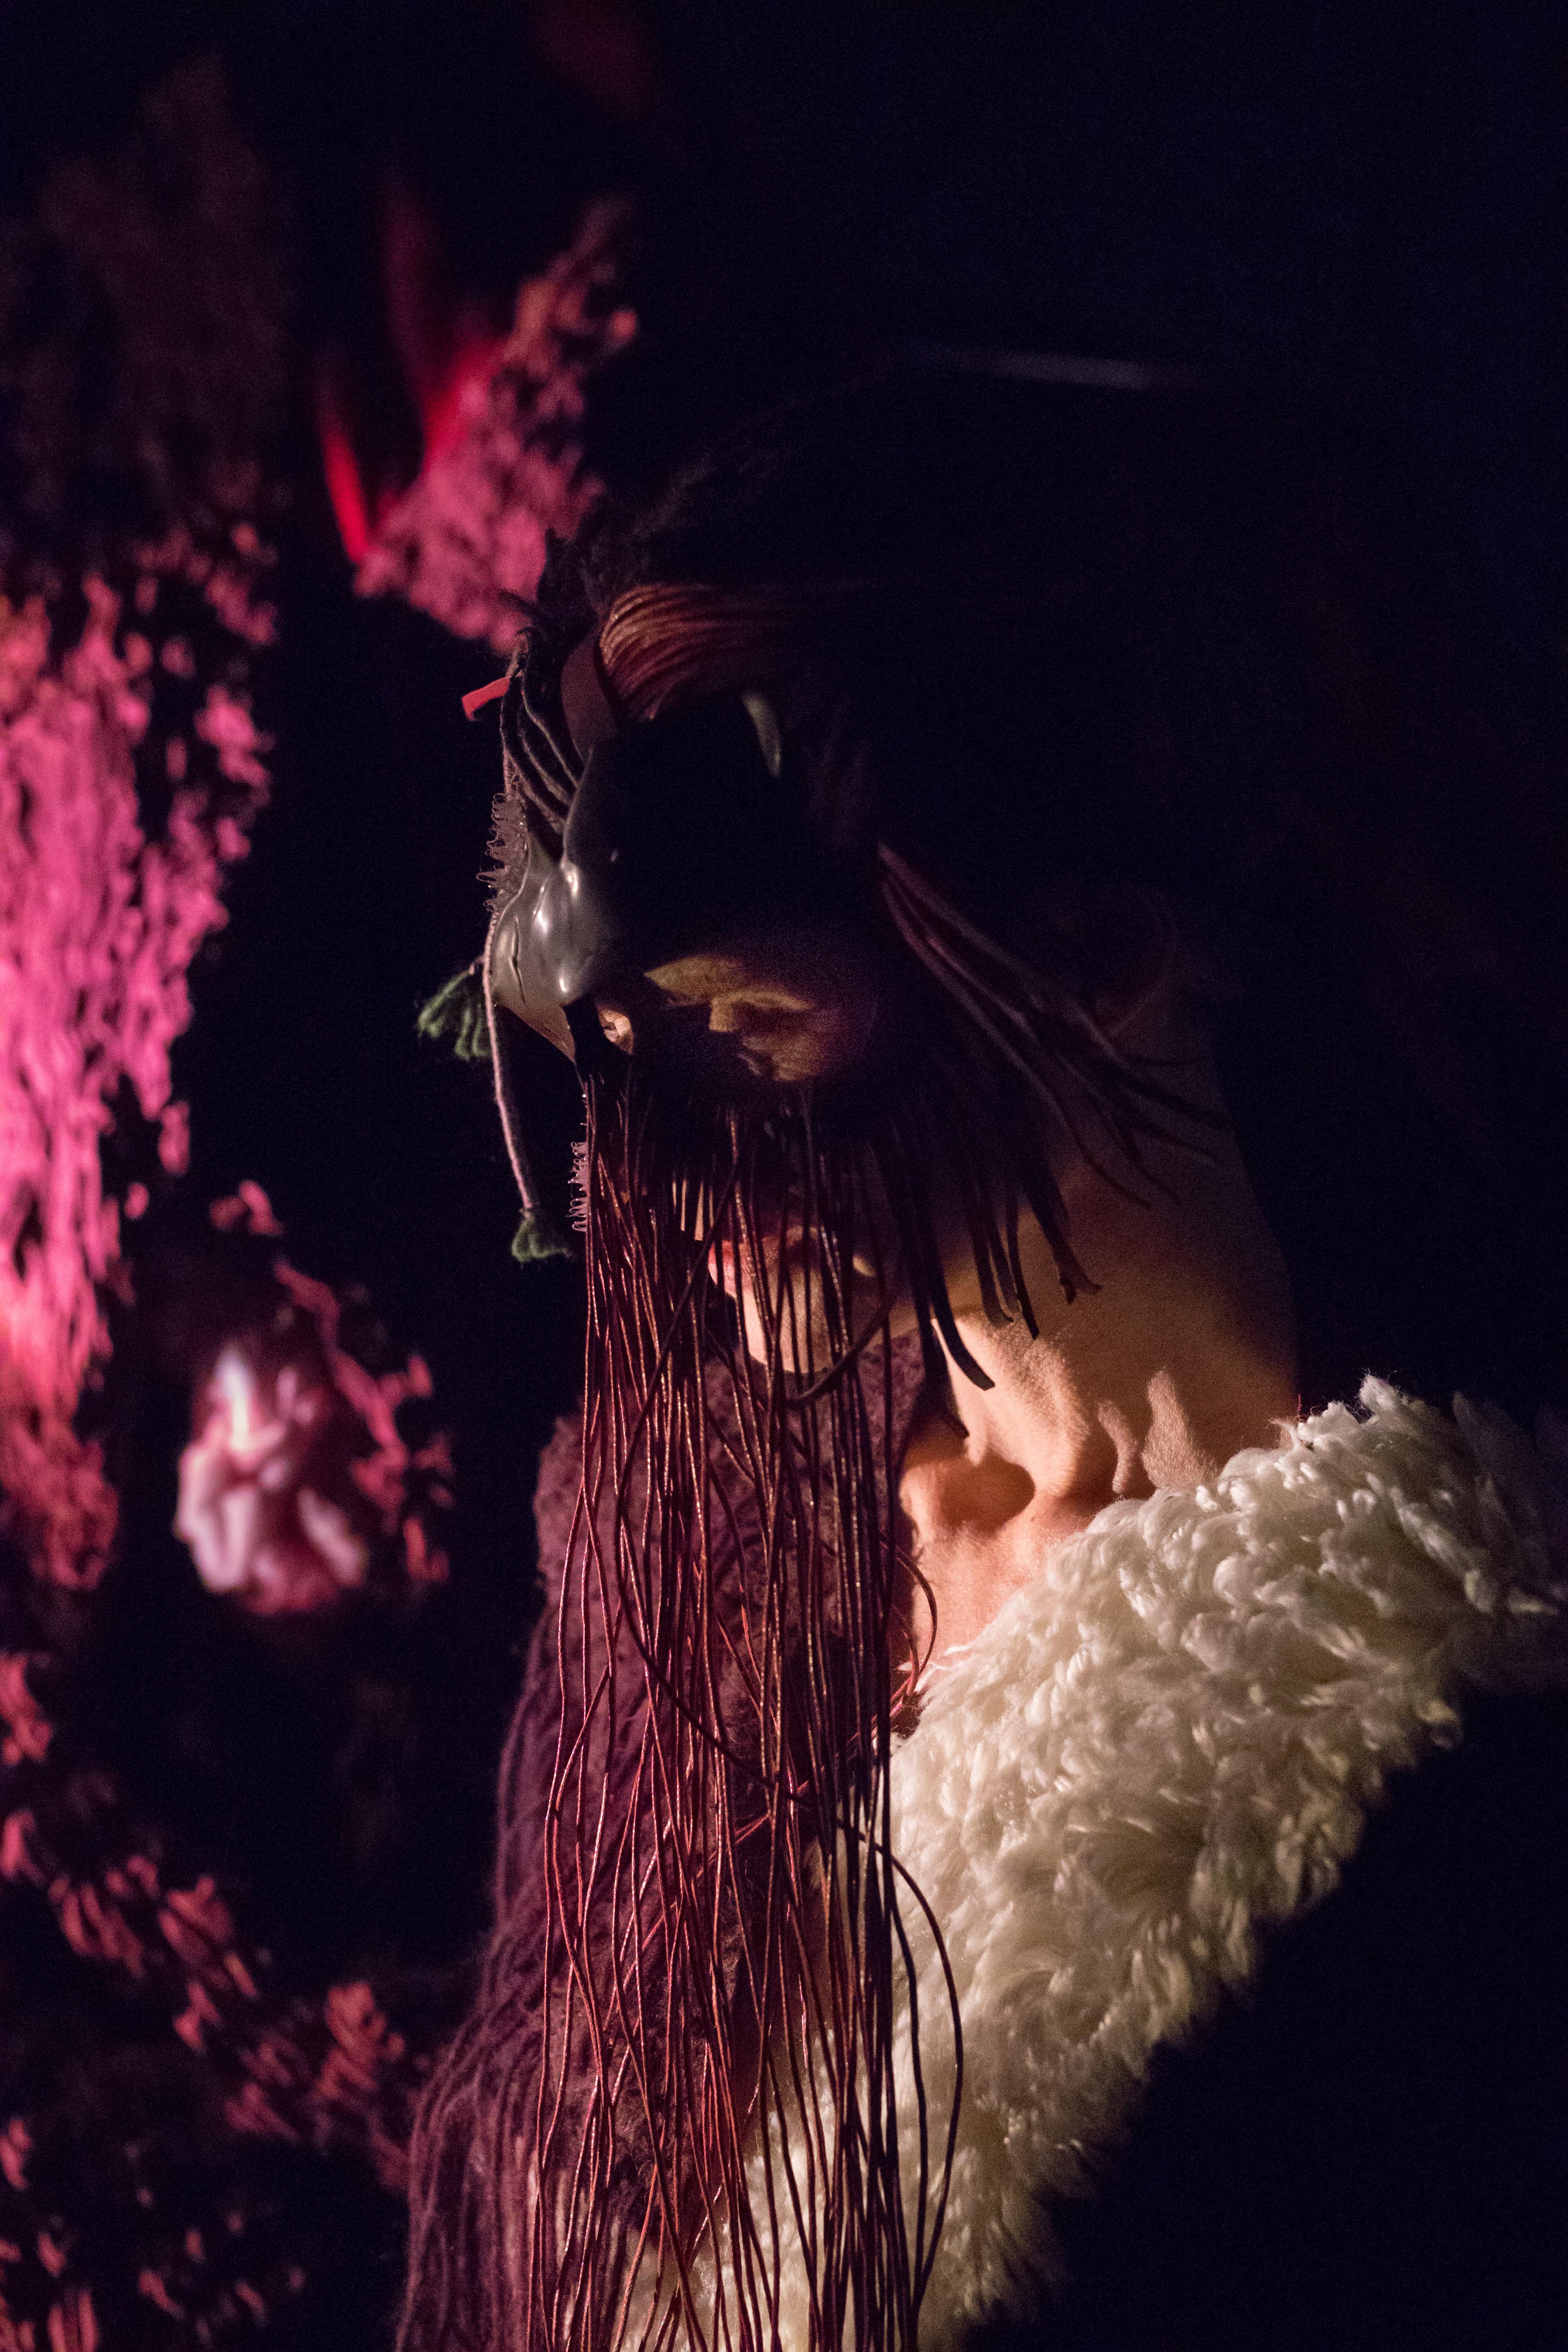 Anmeldelse: Horse Inside Out, ARoS Aarhus Kunstmuseum (Wunderland)